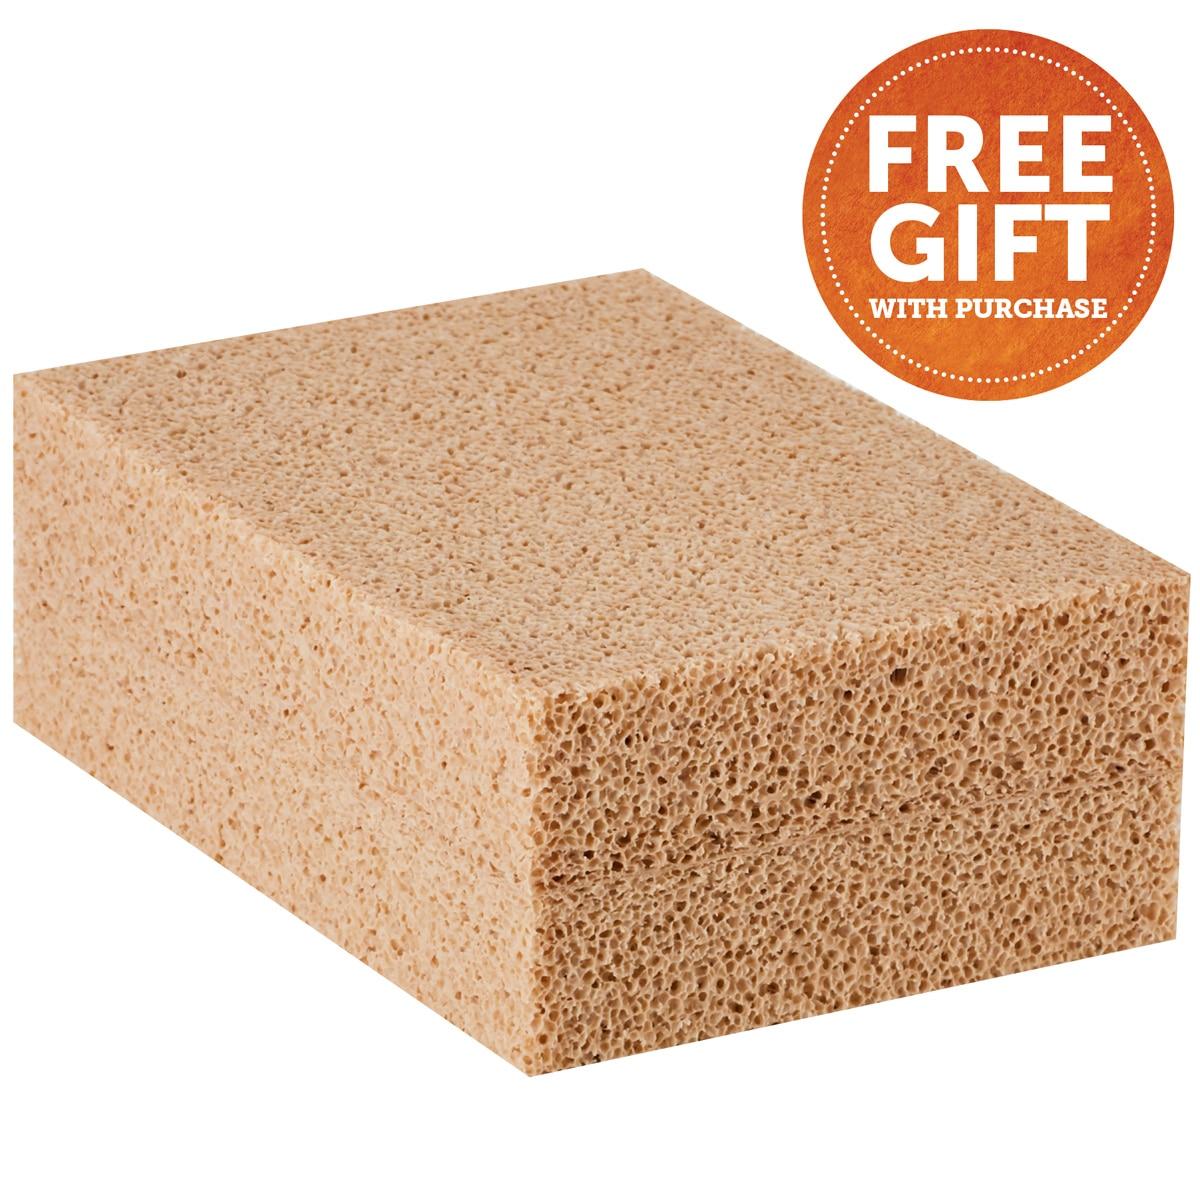 5 Star All Around Pad - FREE Cleaning Sponge